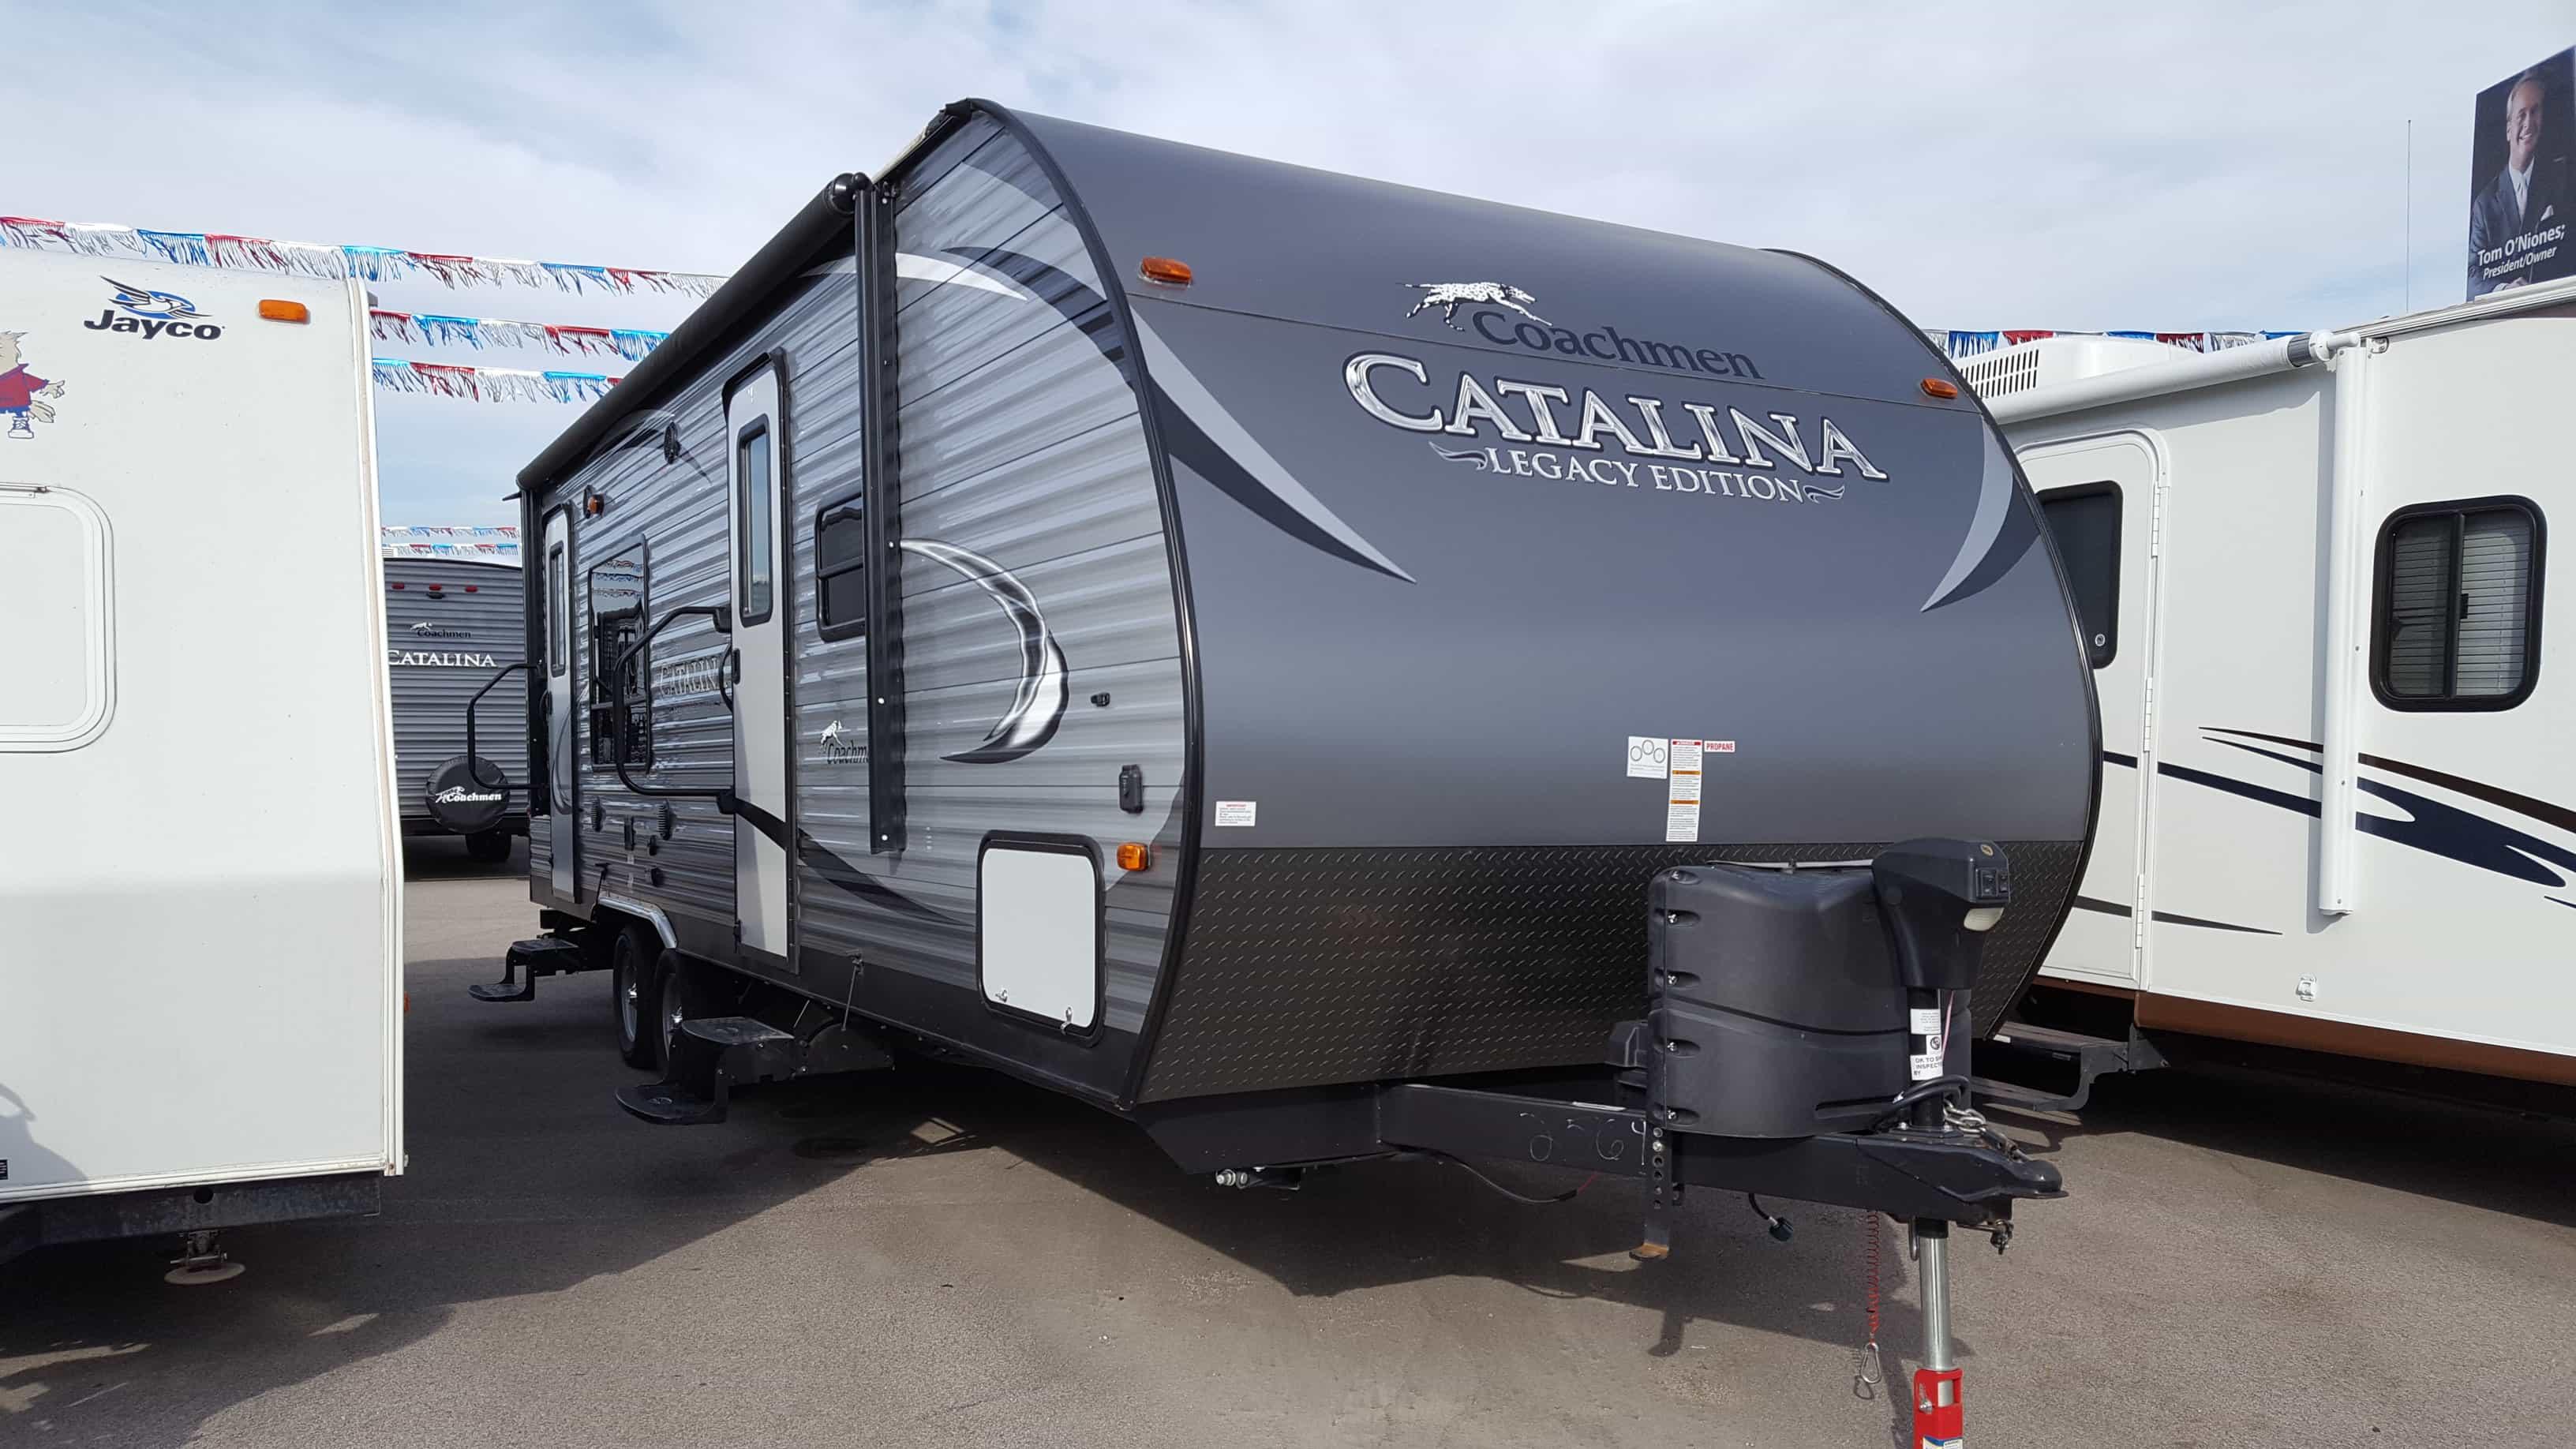 USED 2017 Coachmen CATALINA 253RKS - American RV